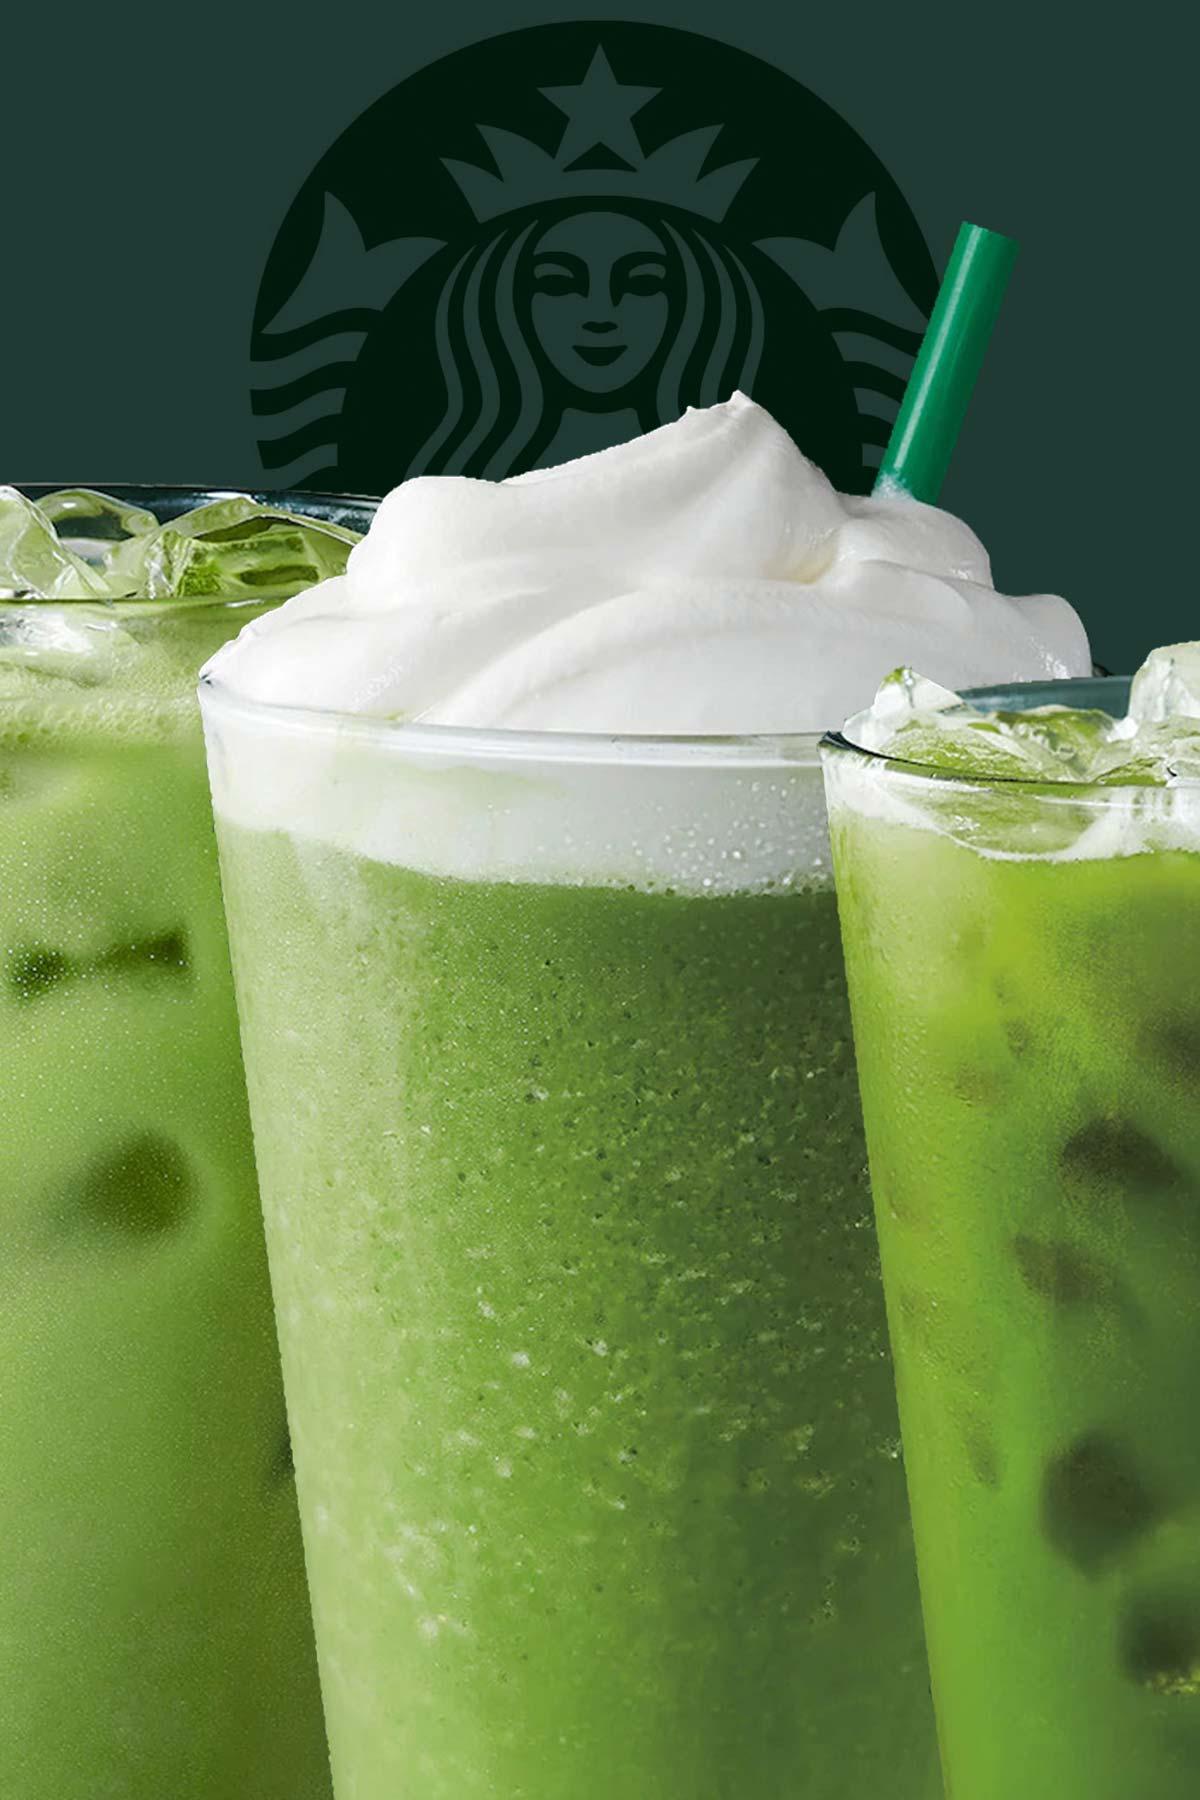 Three Starbucks drinks in glass cups.